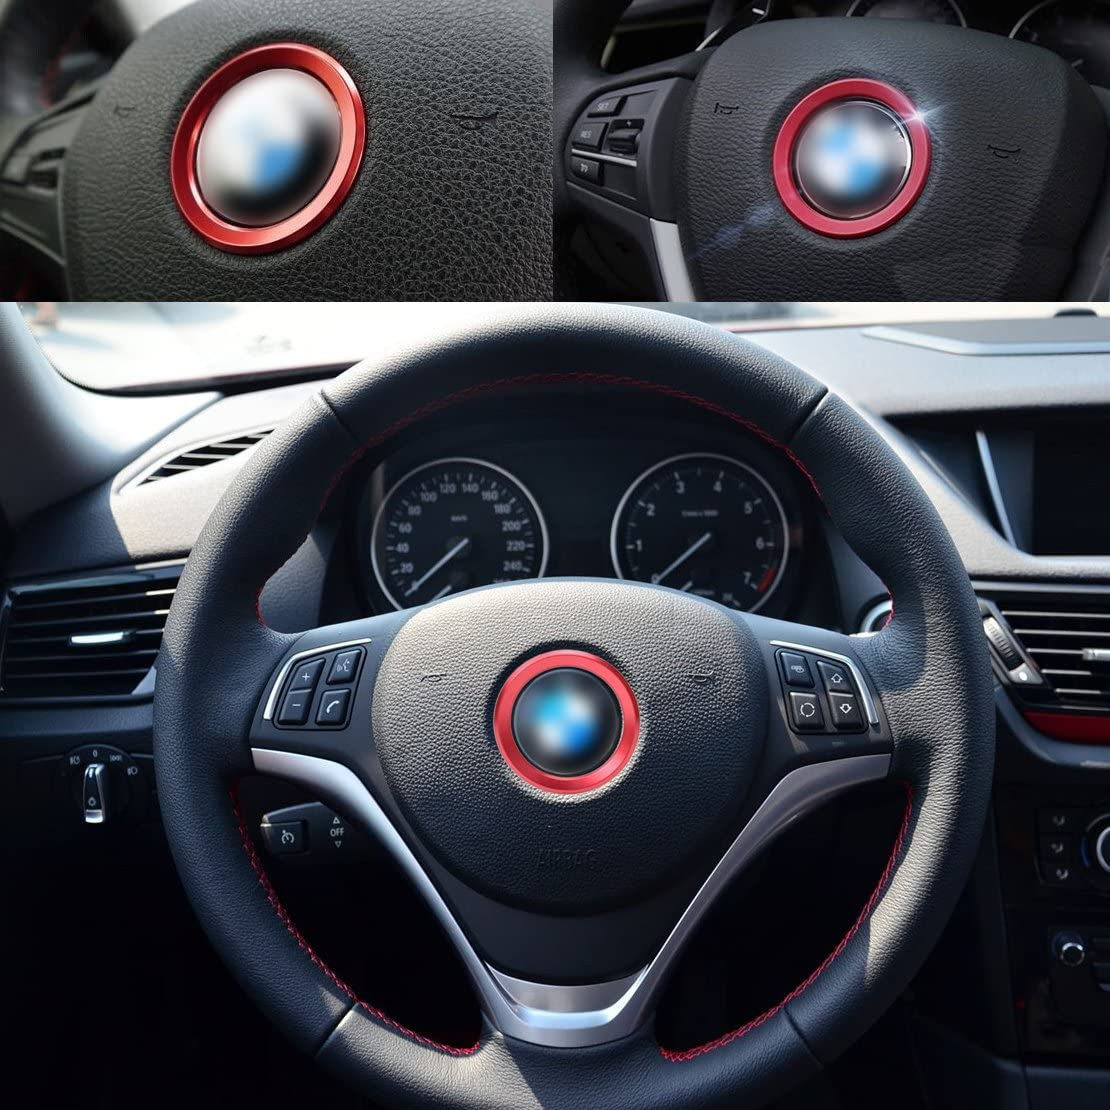 Beler Rot Car Lenkrad Mitte Dekoration Ring Trimm Abdeckung Auto